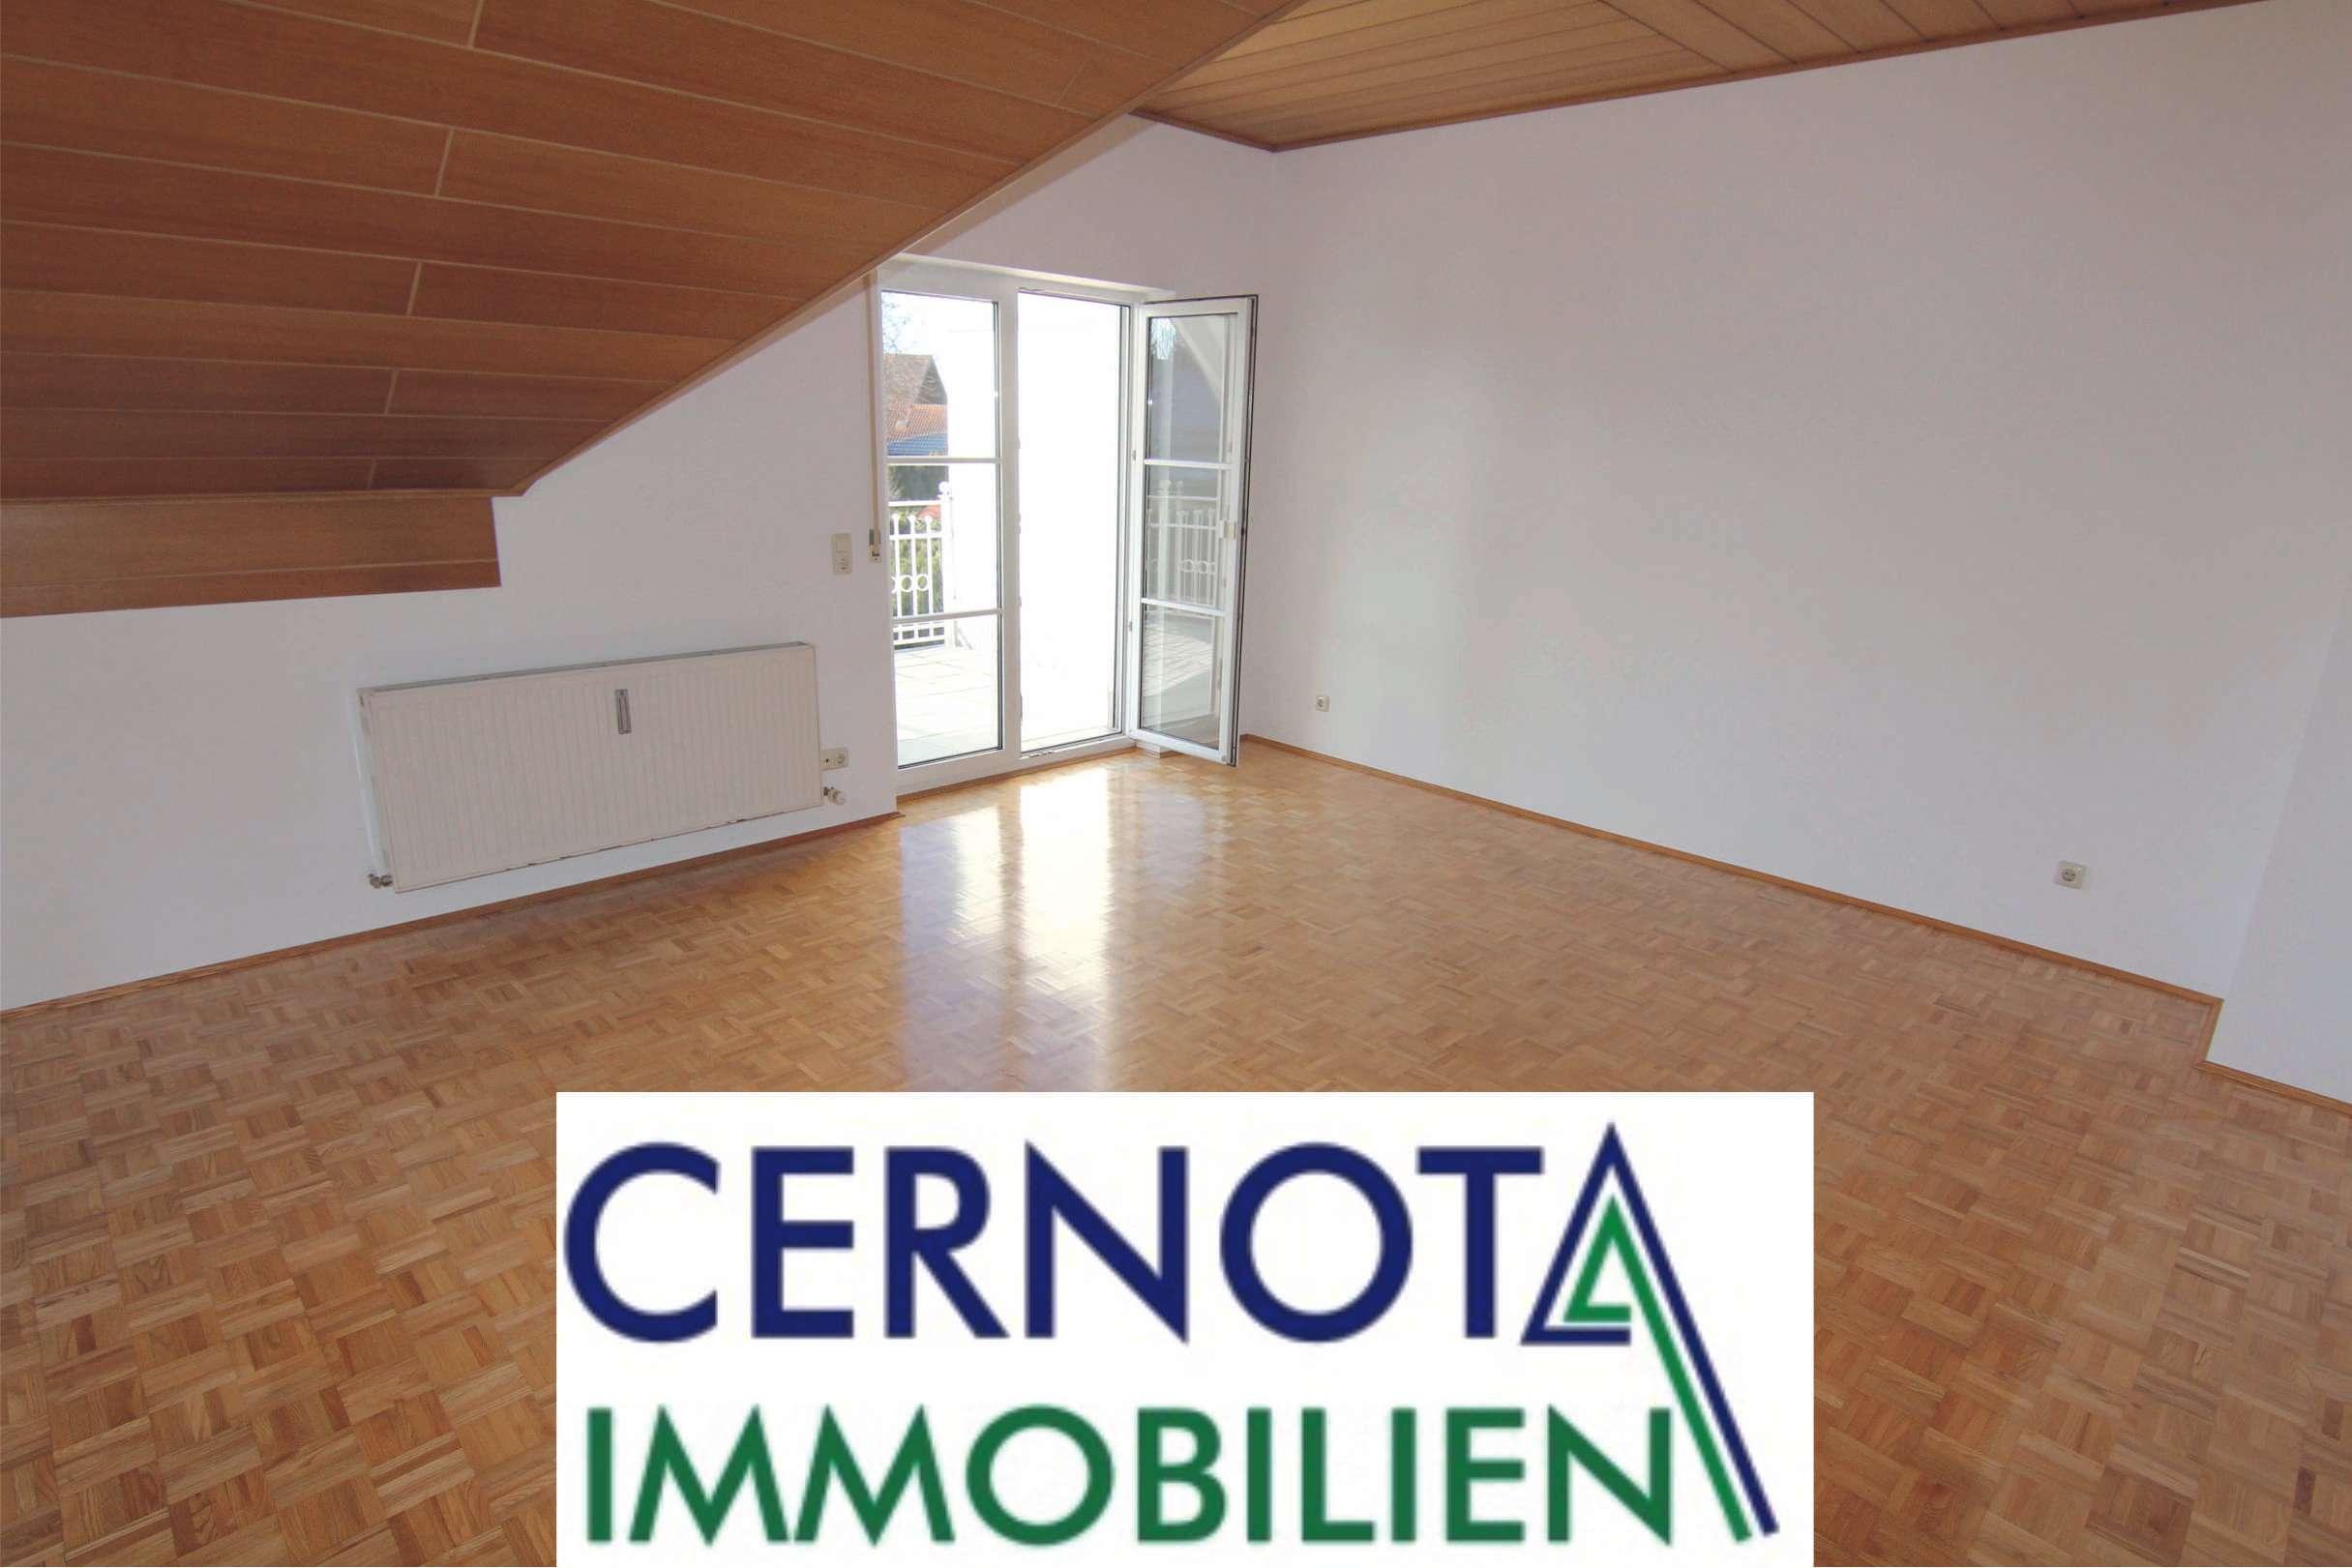 Helle 2 Zimmer Mietwohnung in Bad Füssing - Cernota Immobilien in